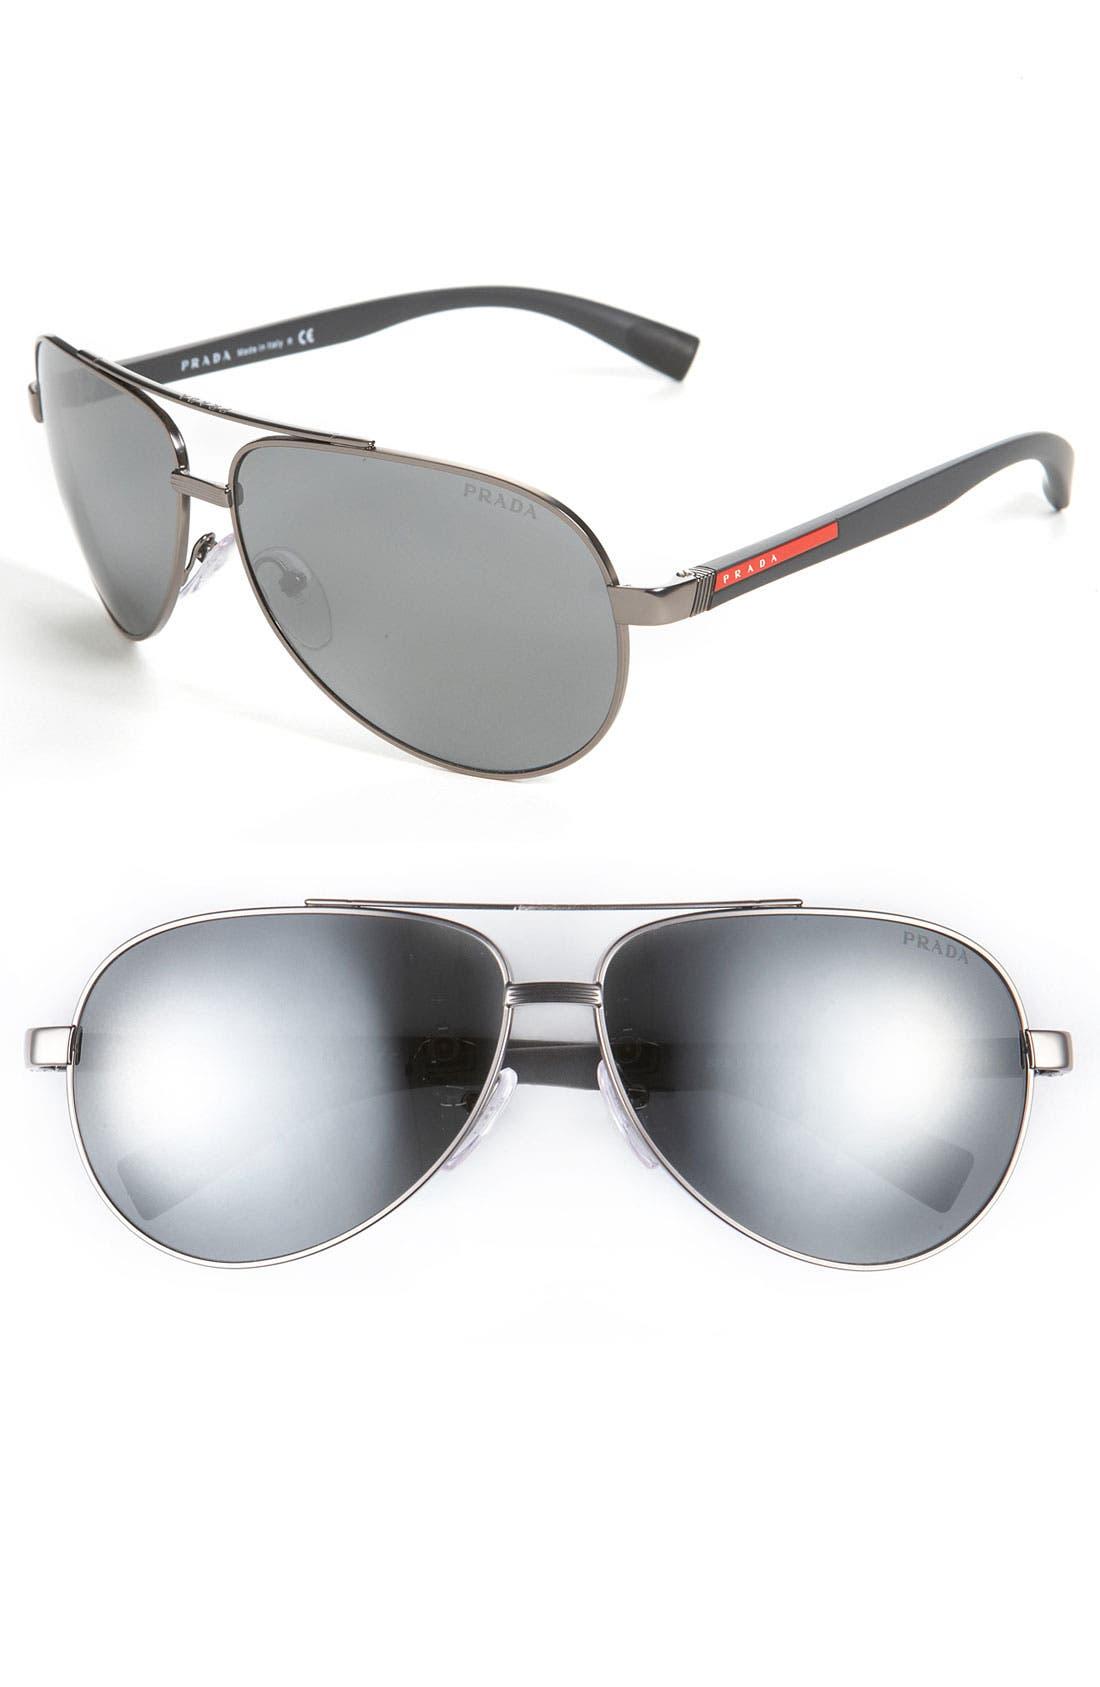 Main Image - Prada 63mm Metal Aviator Sunglasses